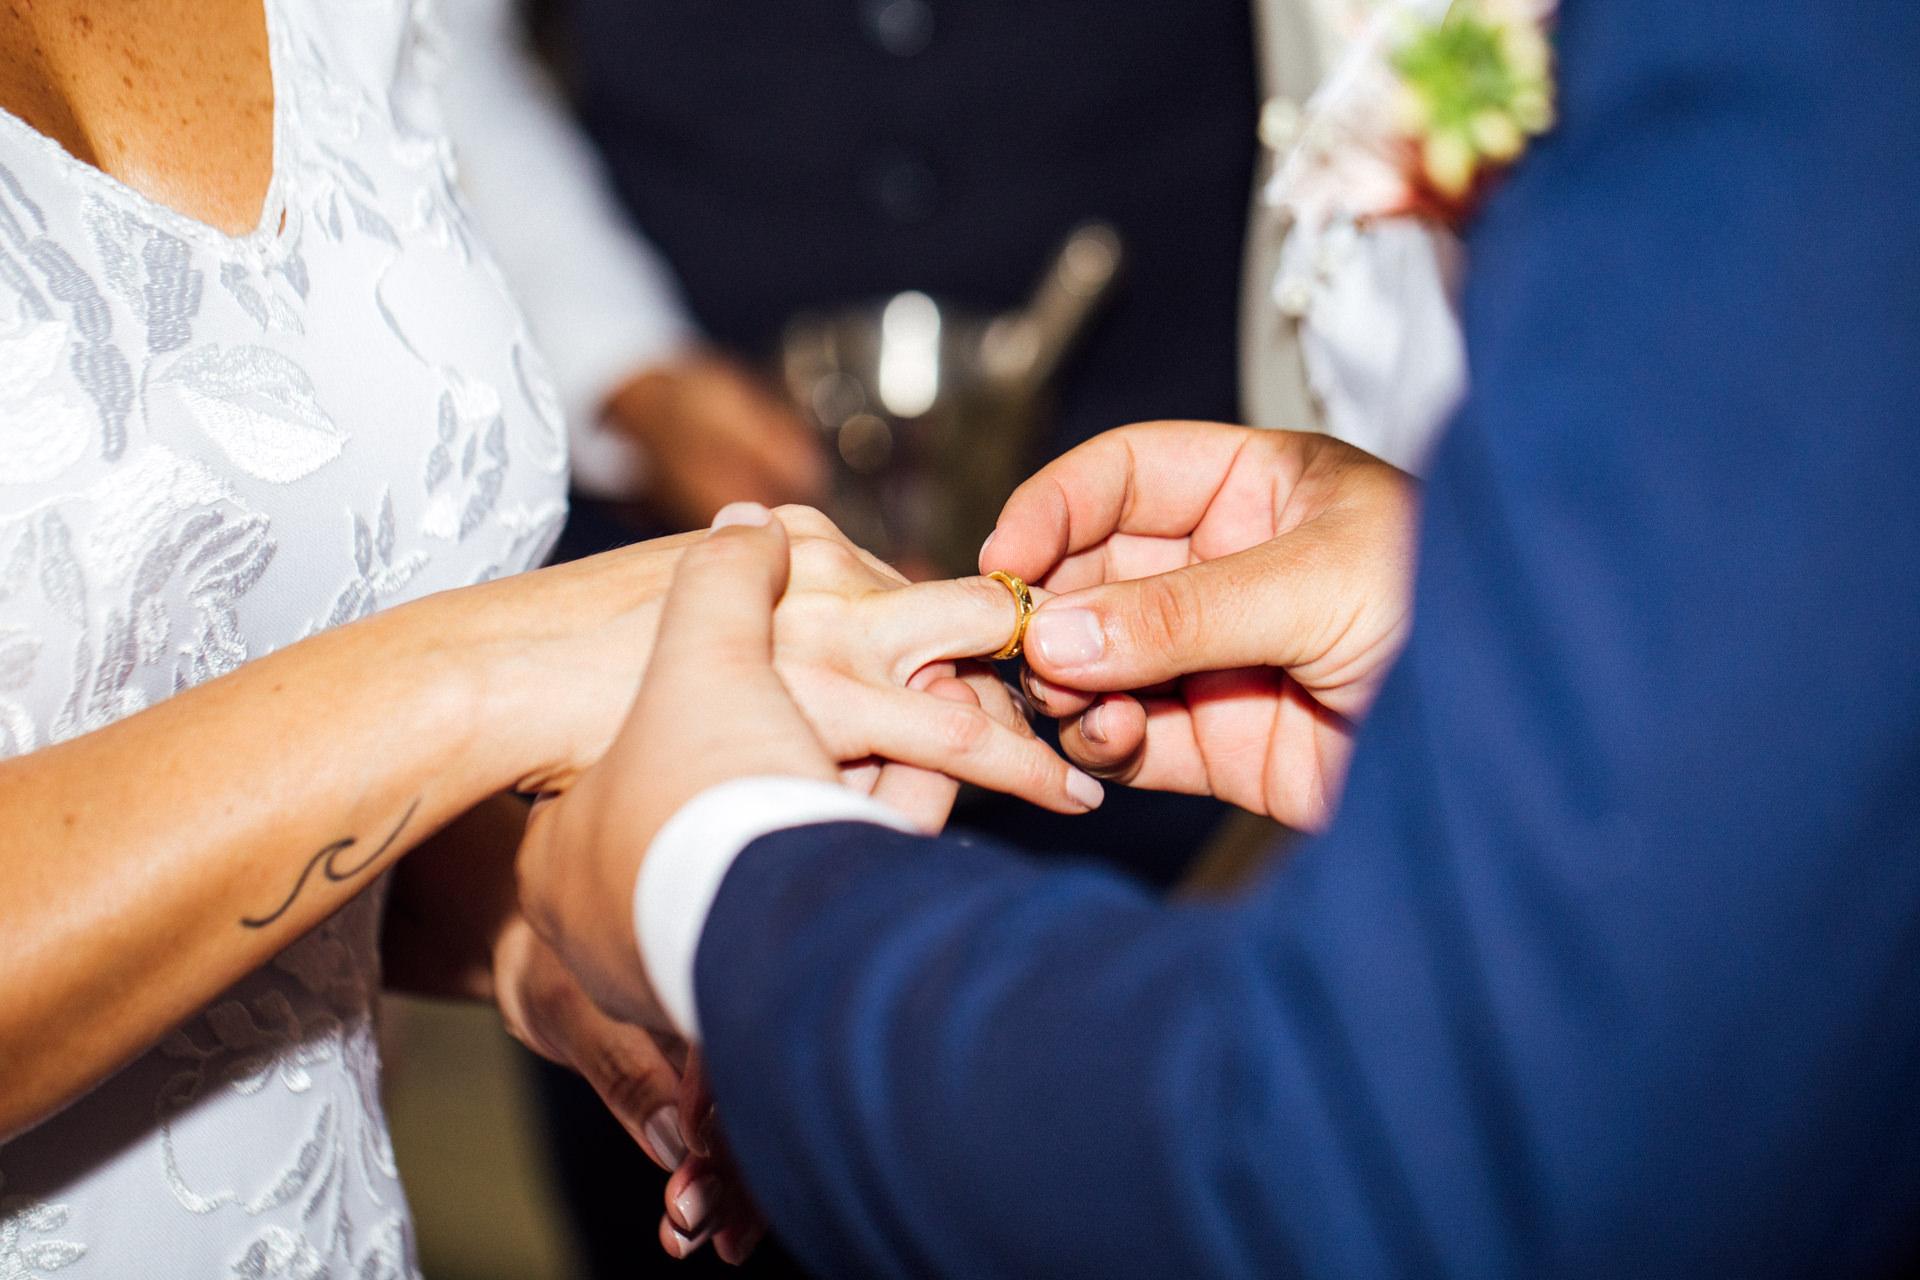 Wedding-Boda-Matrimonio-Fotografo-Fotografia-bodas-Medellin-Llanogrande-Colombia-Bogota-Cartagena-Miami-Wed-Destination-Photojournalism (116).JPG